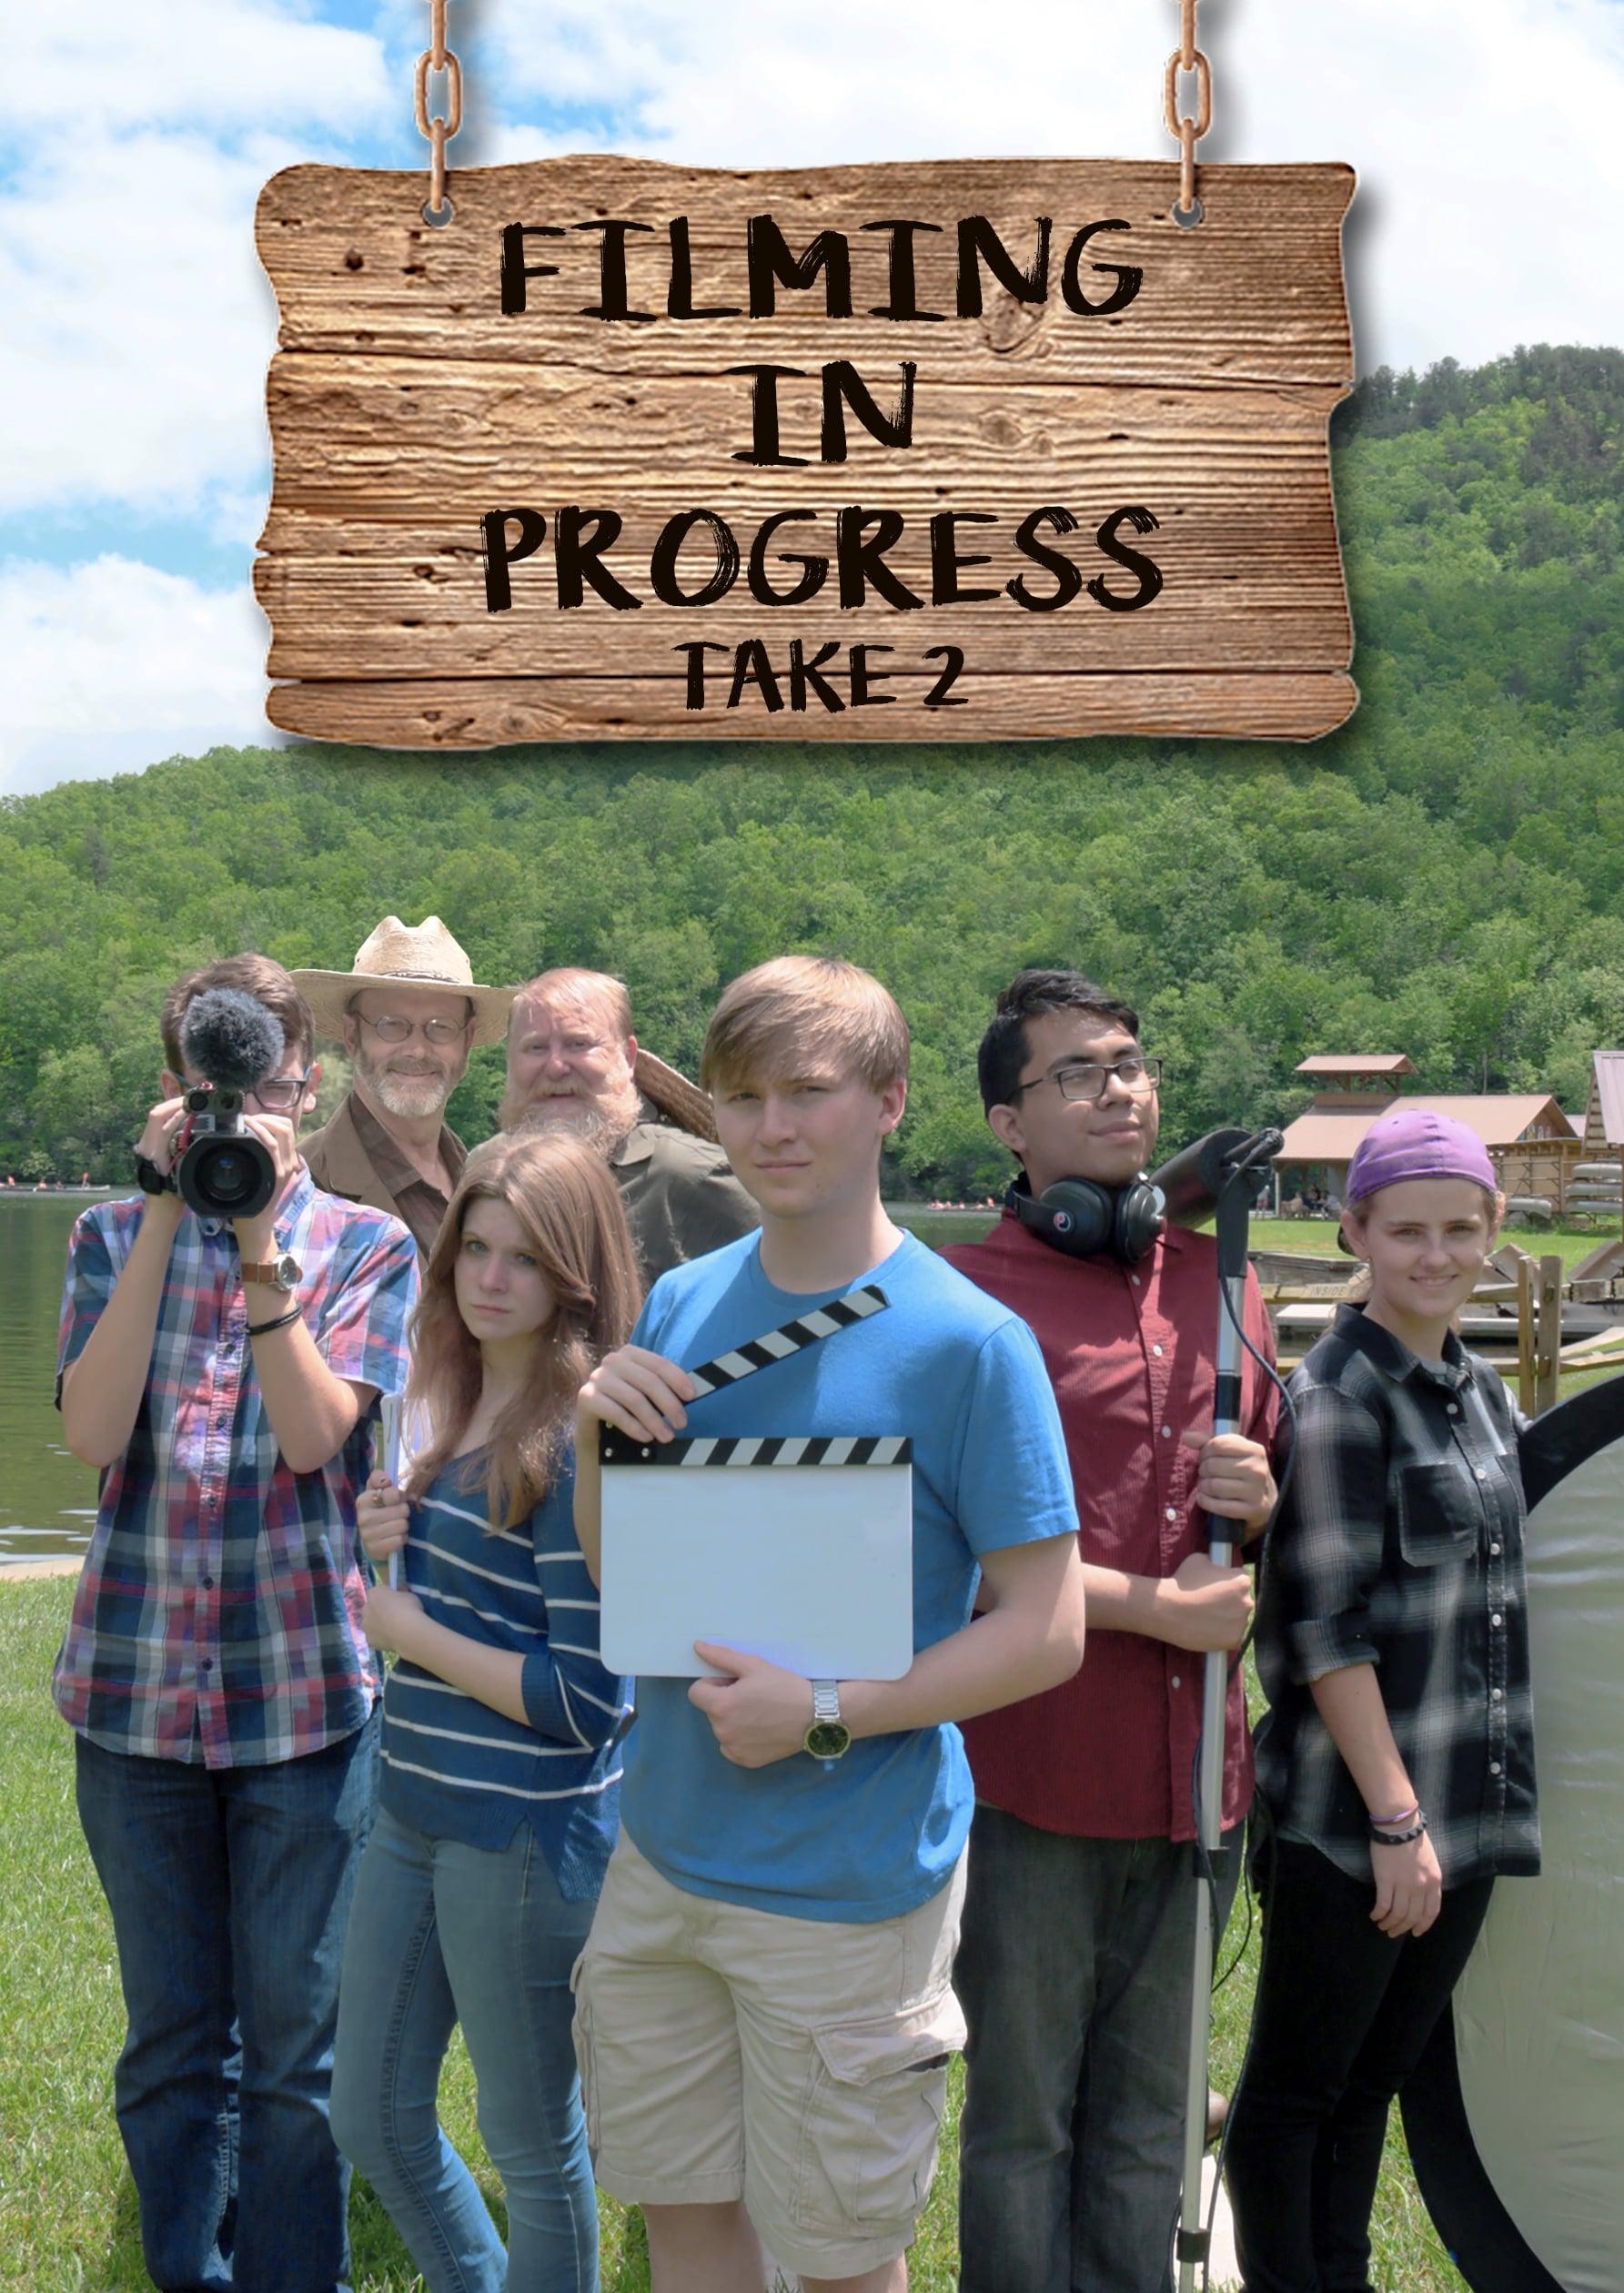 Filming in Progress – Take 2